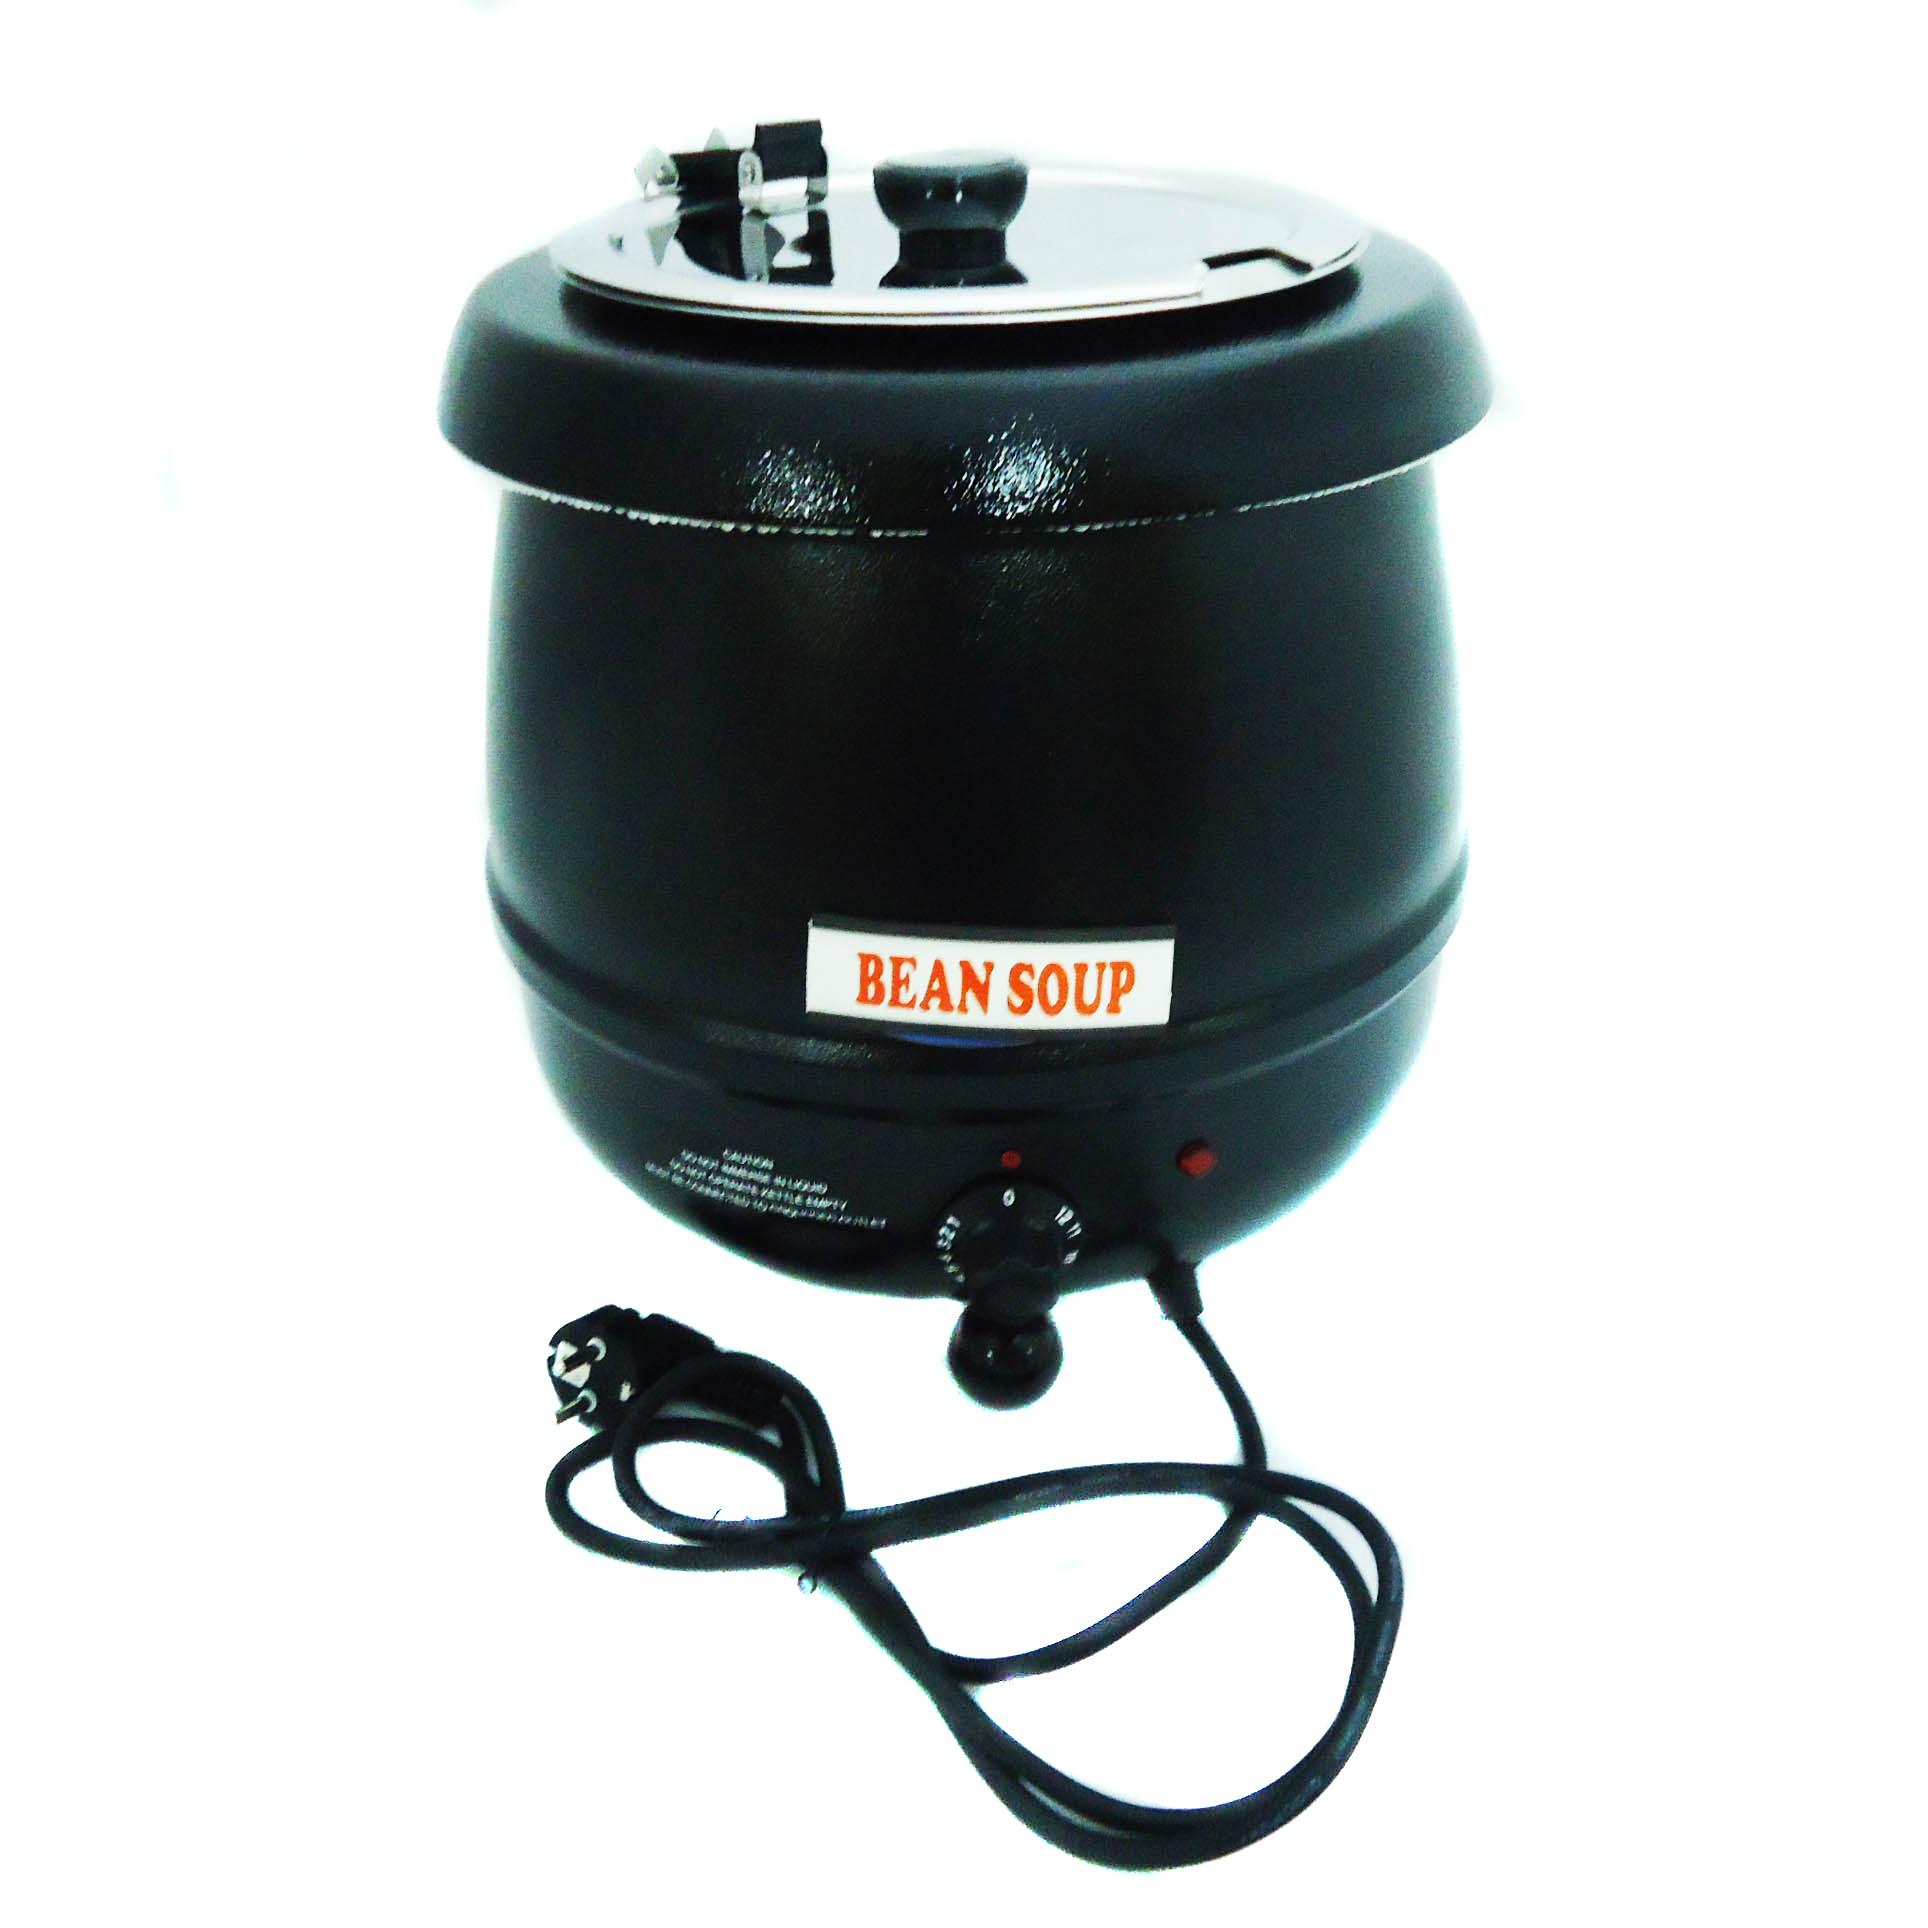 SB6000 Σουπιέρα Επαγγελματική Ηλεκτρική Χωρητικότητα: 10Lit επαγγελματικός εξοπλισμός   φούρνοι μικροκύματα κρεπιέρες βαφλιέρες φριτέζες   μ